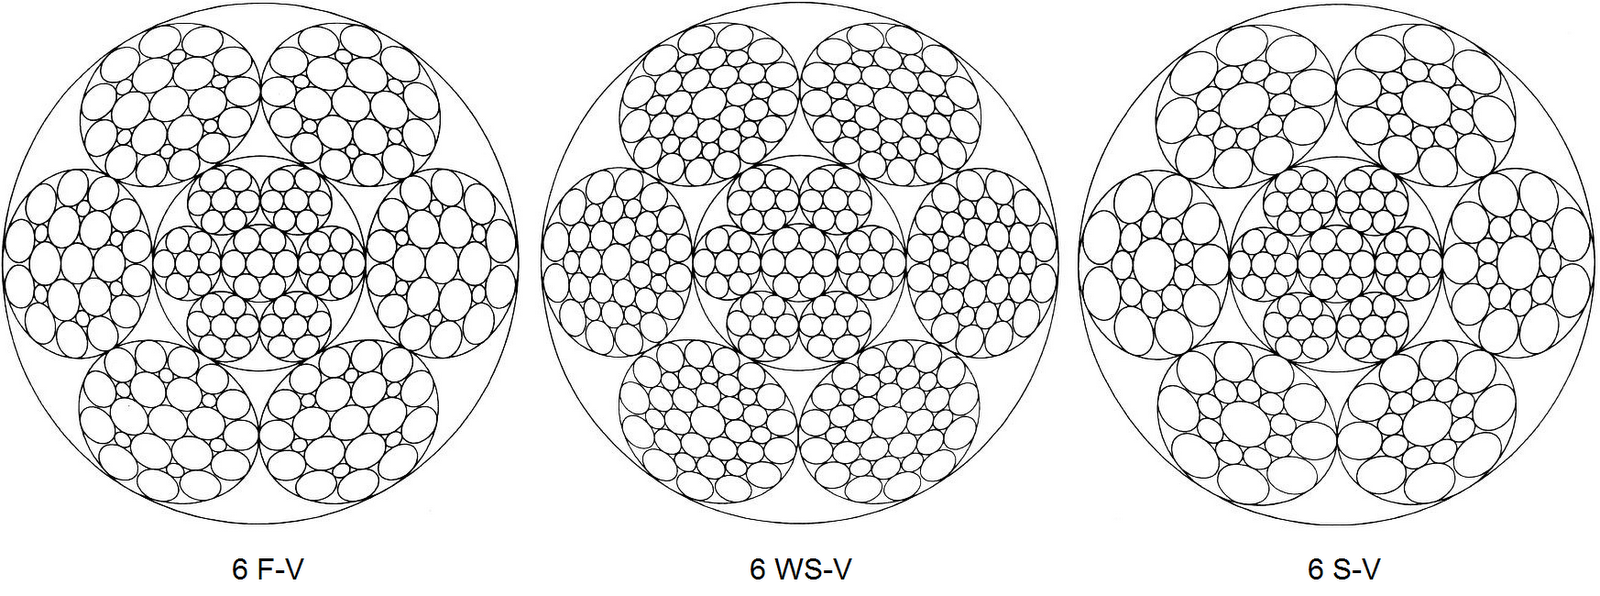 braant drahtseil: Forst - Drahtseile Python 6 R+F robust und flexibel